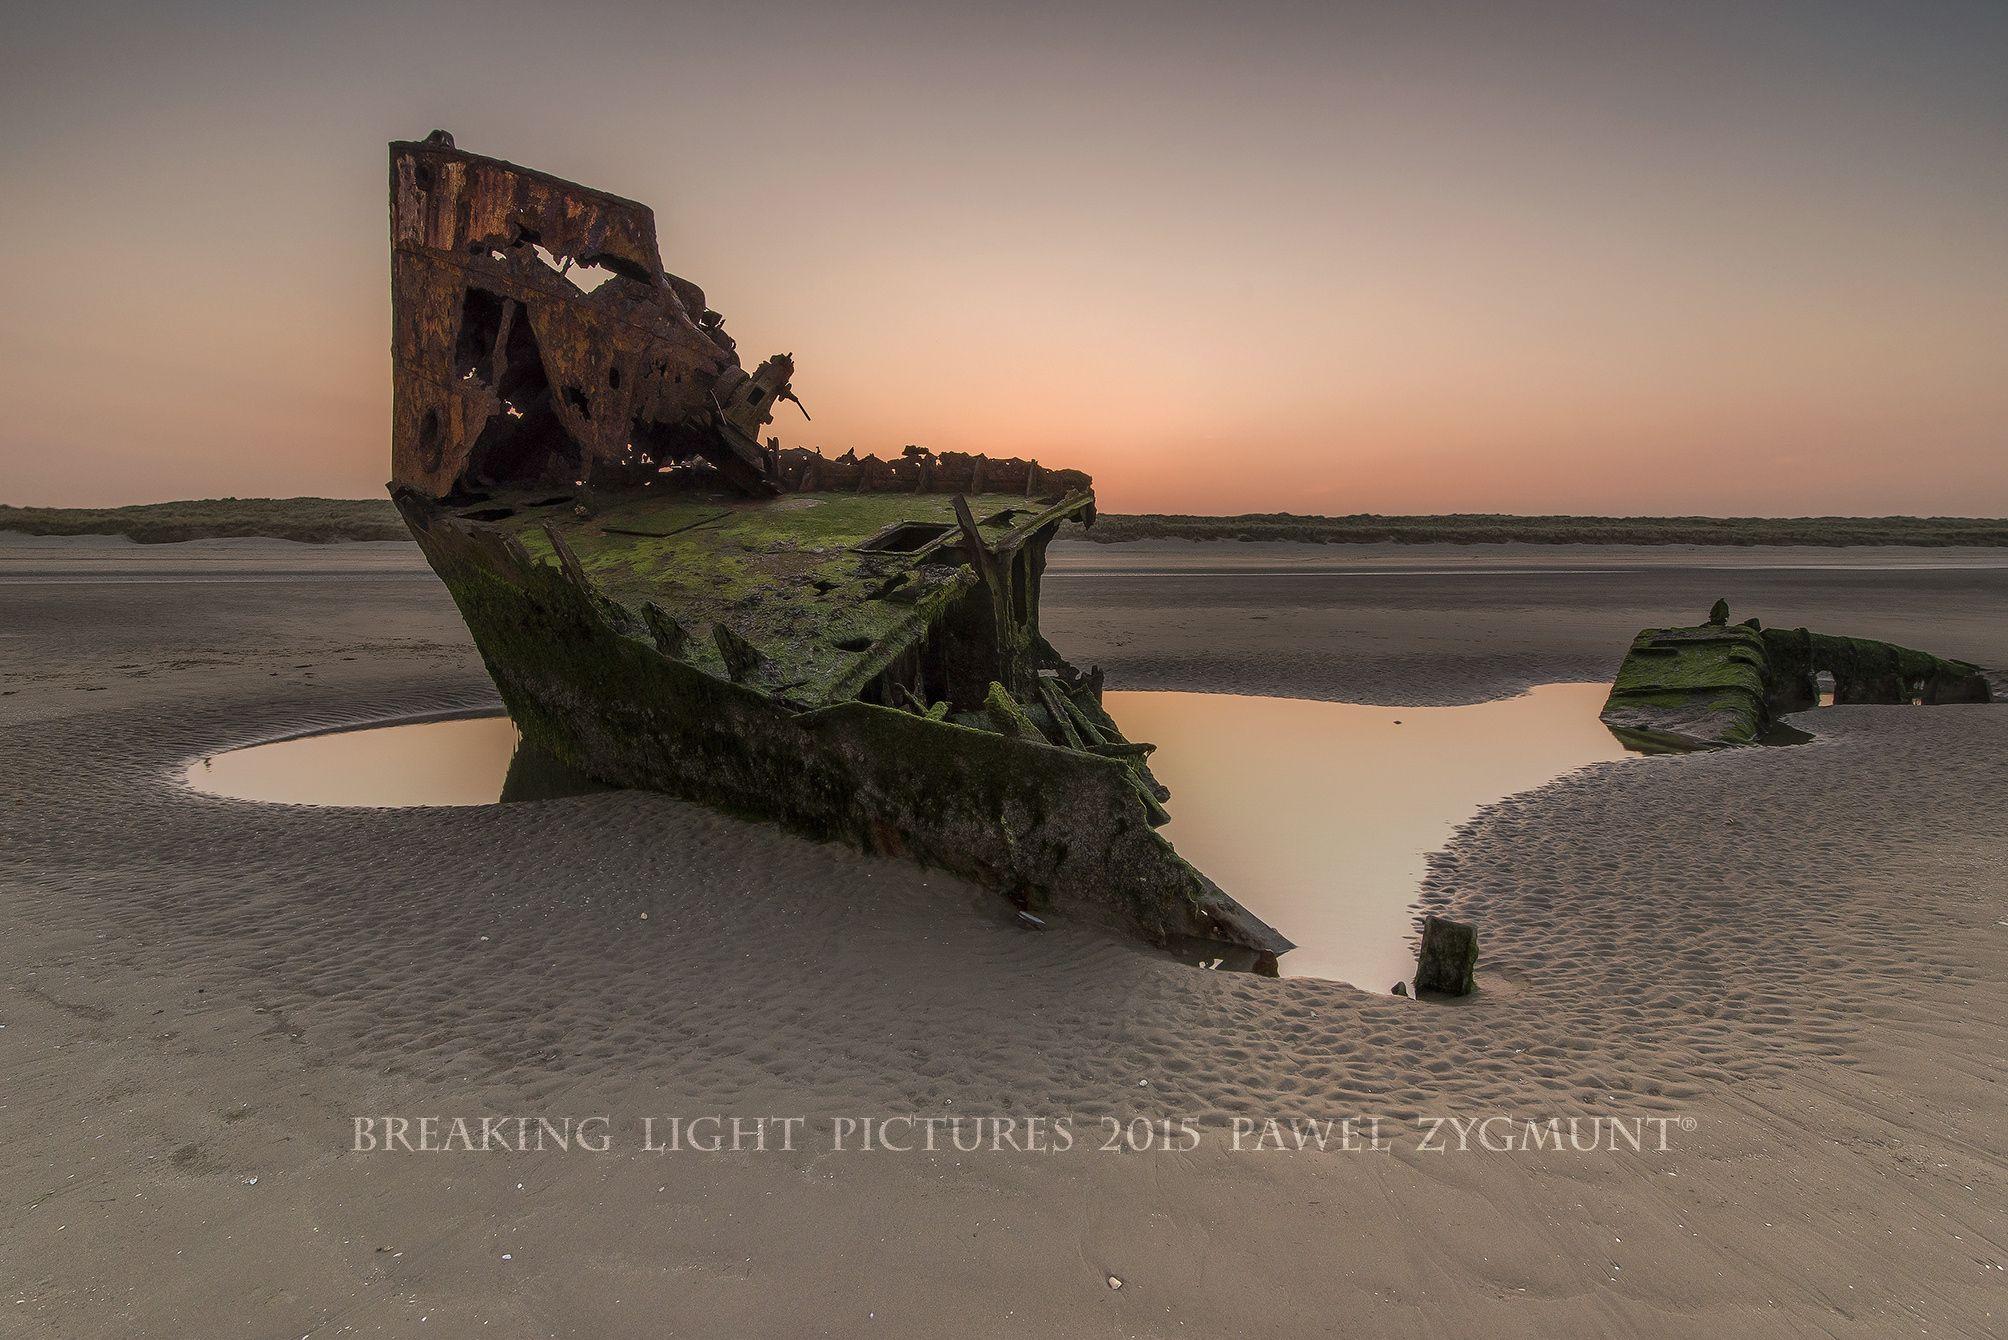 wreckage by Pawel Zygmunt on 500px